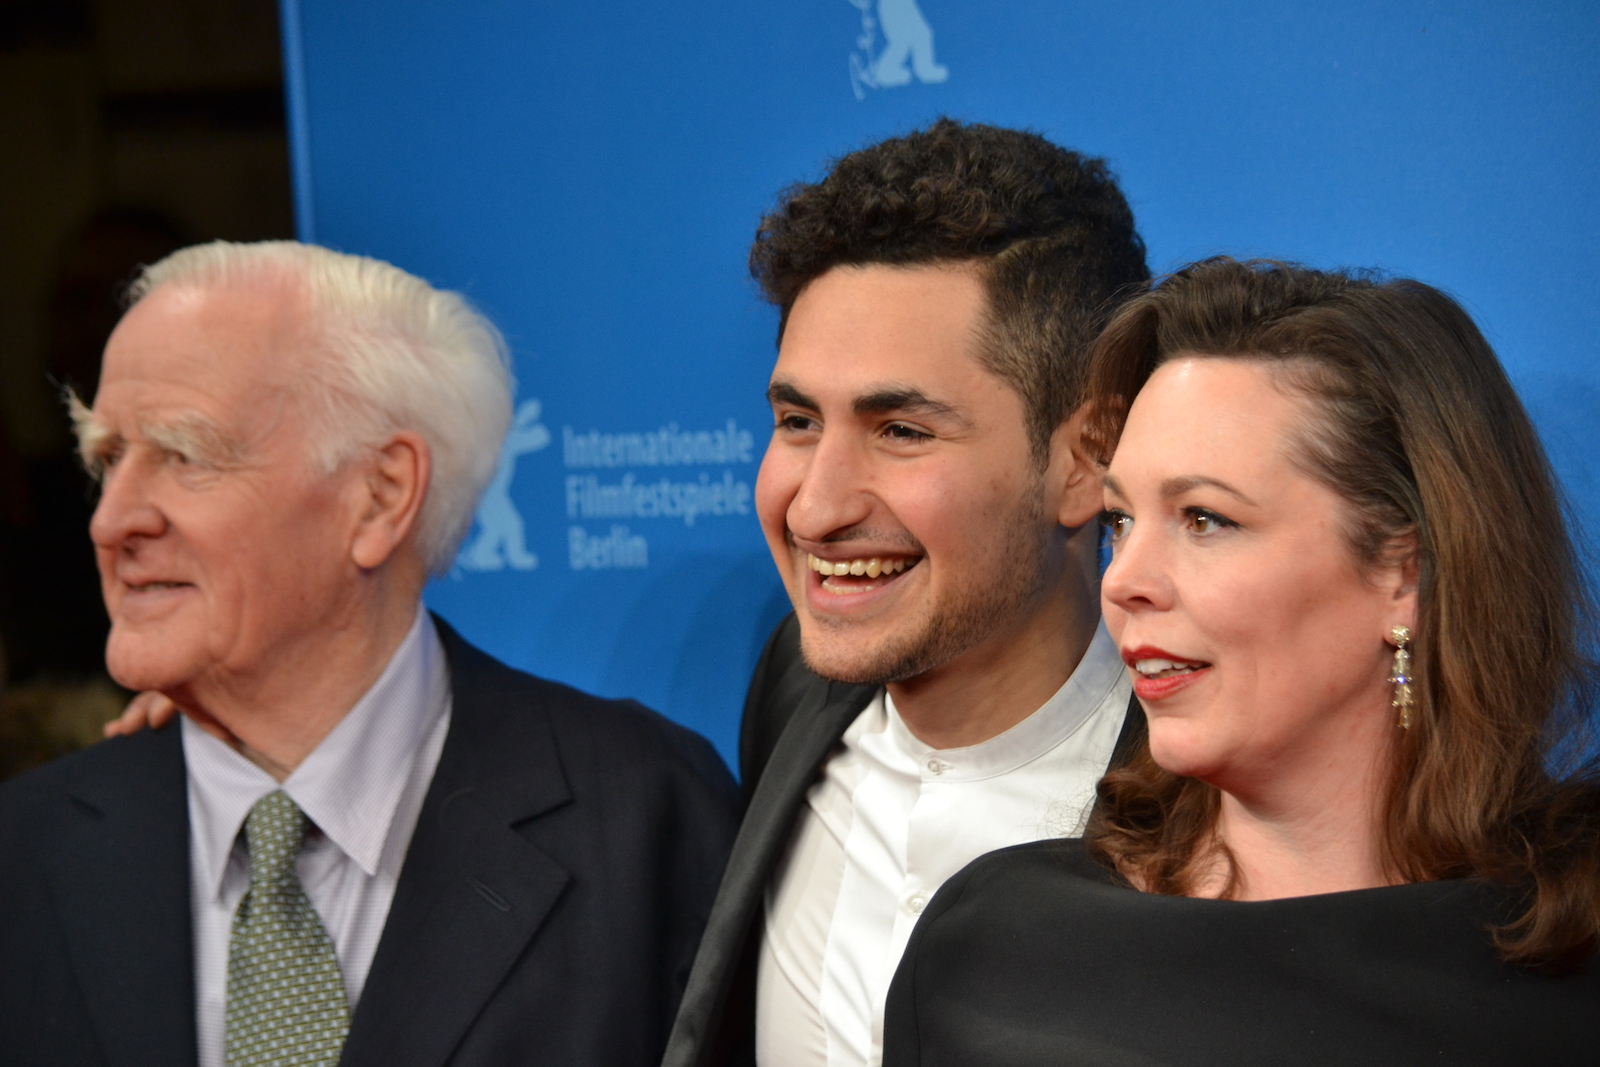 Berlino 2016: John Le Carré, Amir El-Masry, Olivia Colman sul red carpet di The Night Manager